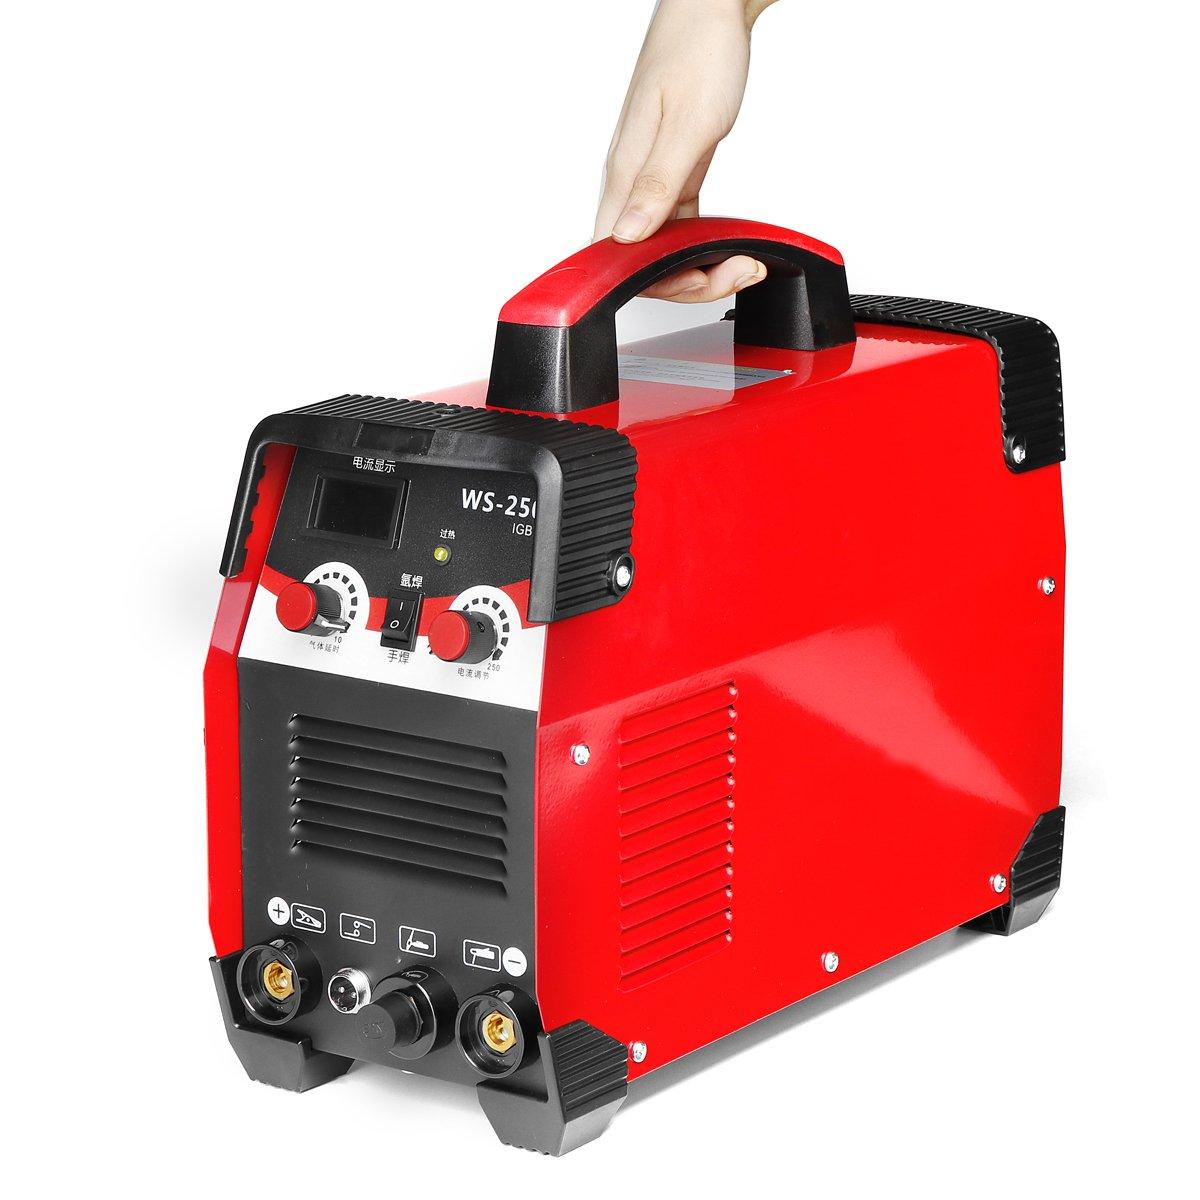 2IN1 220V 7700W TIG ARC Electric Welding Machine 20 250A MMA IGBT STICK Inverter For Welding